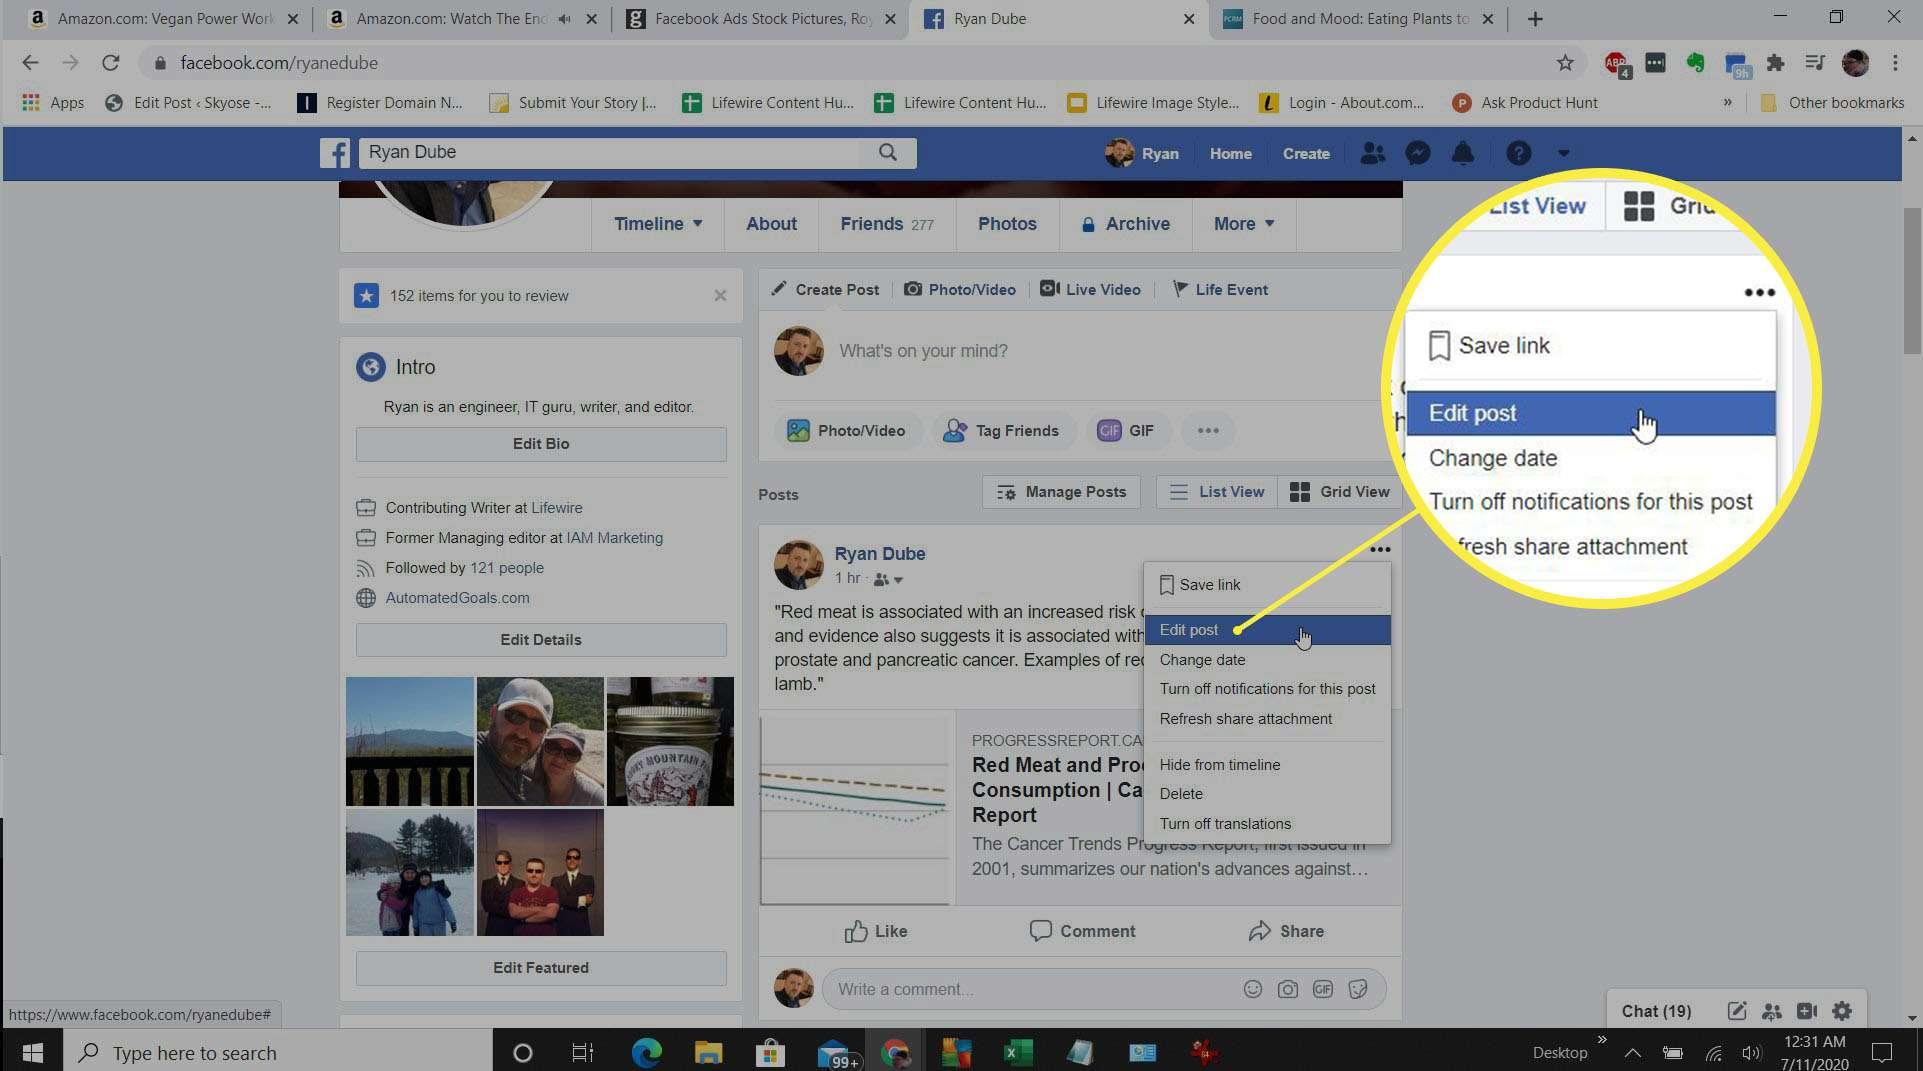 Screenshot of editing a post on Facebook.